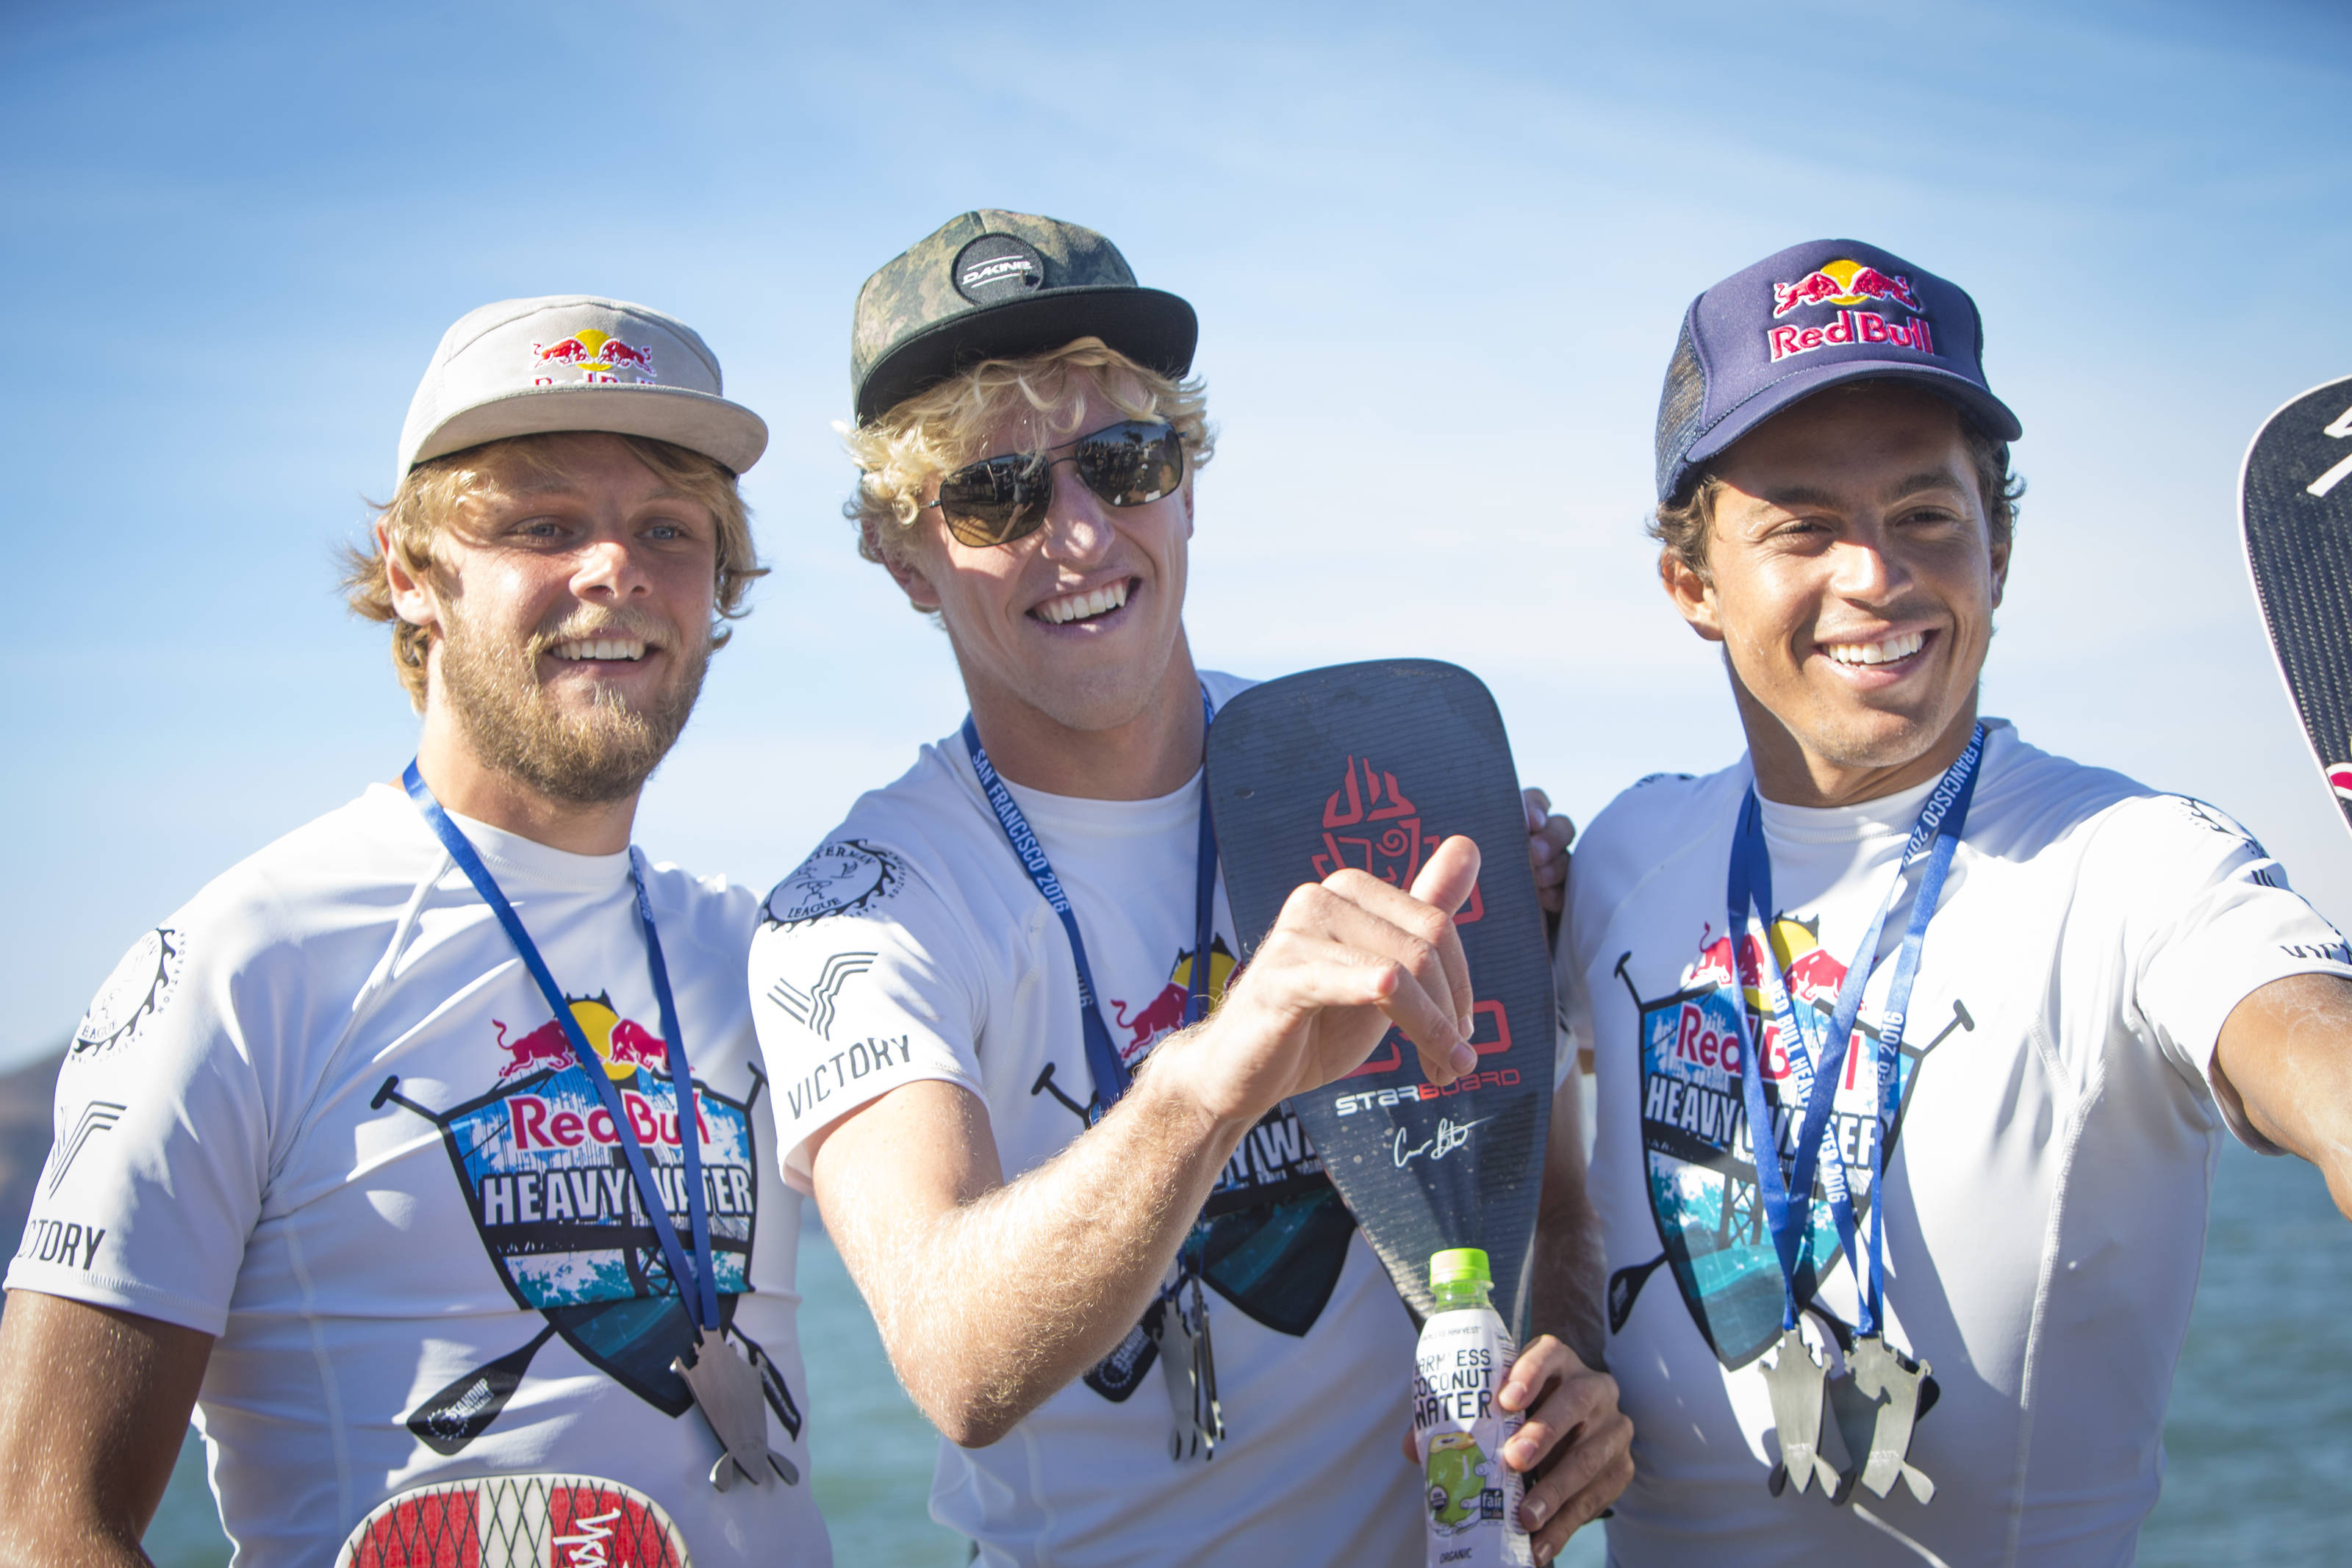 World Tour podiet for 2016. Casper Steinfath nr. 2 (tv), Connor Baxter nr. 1 (mf) & Kai Lenny nr. 3 (th). Photo: Trevor Clark Red Bull Content Pool